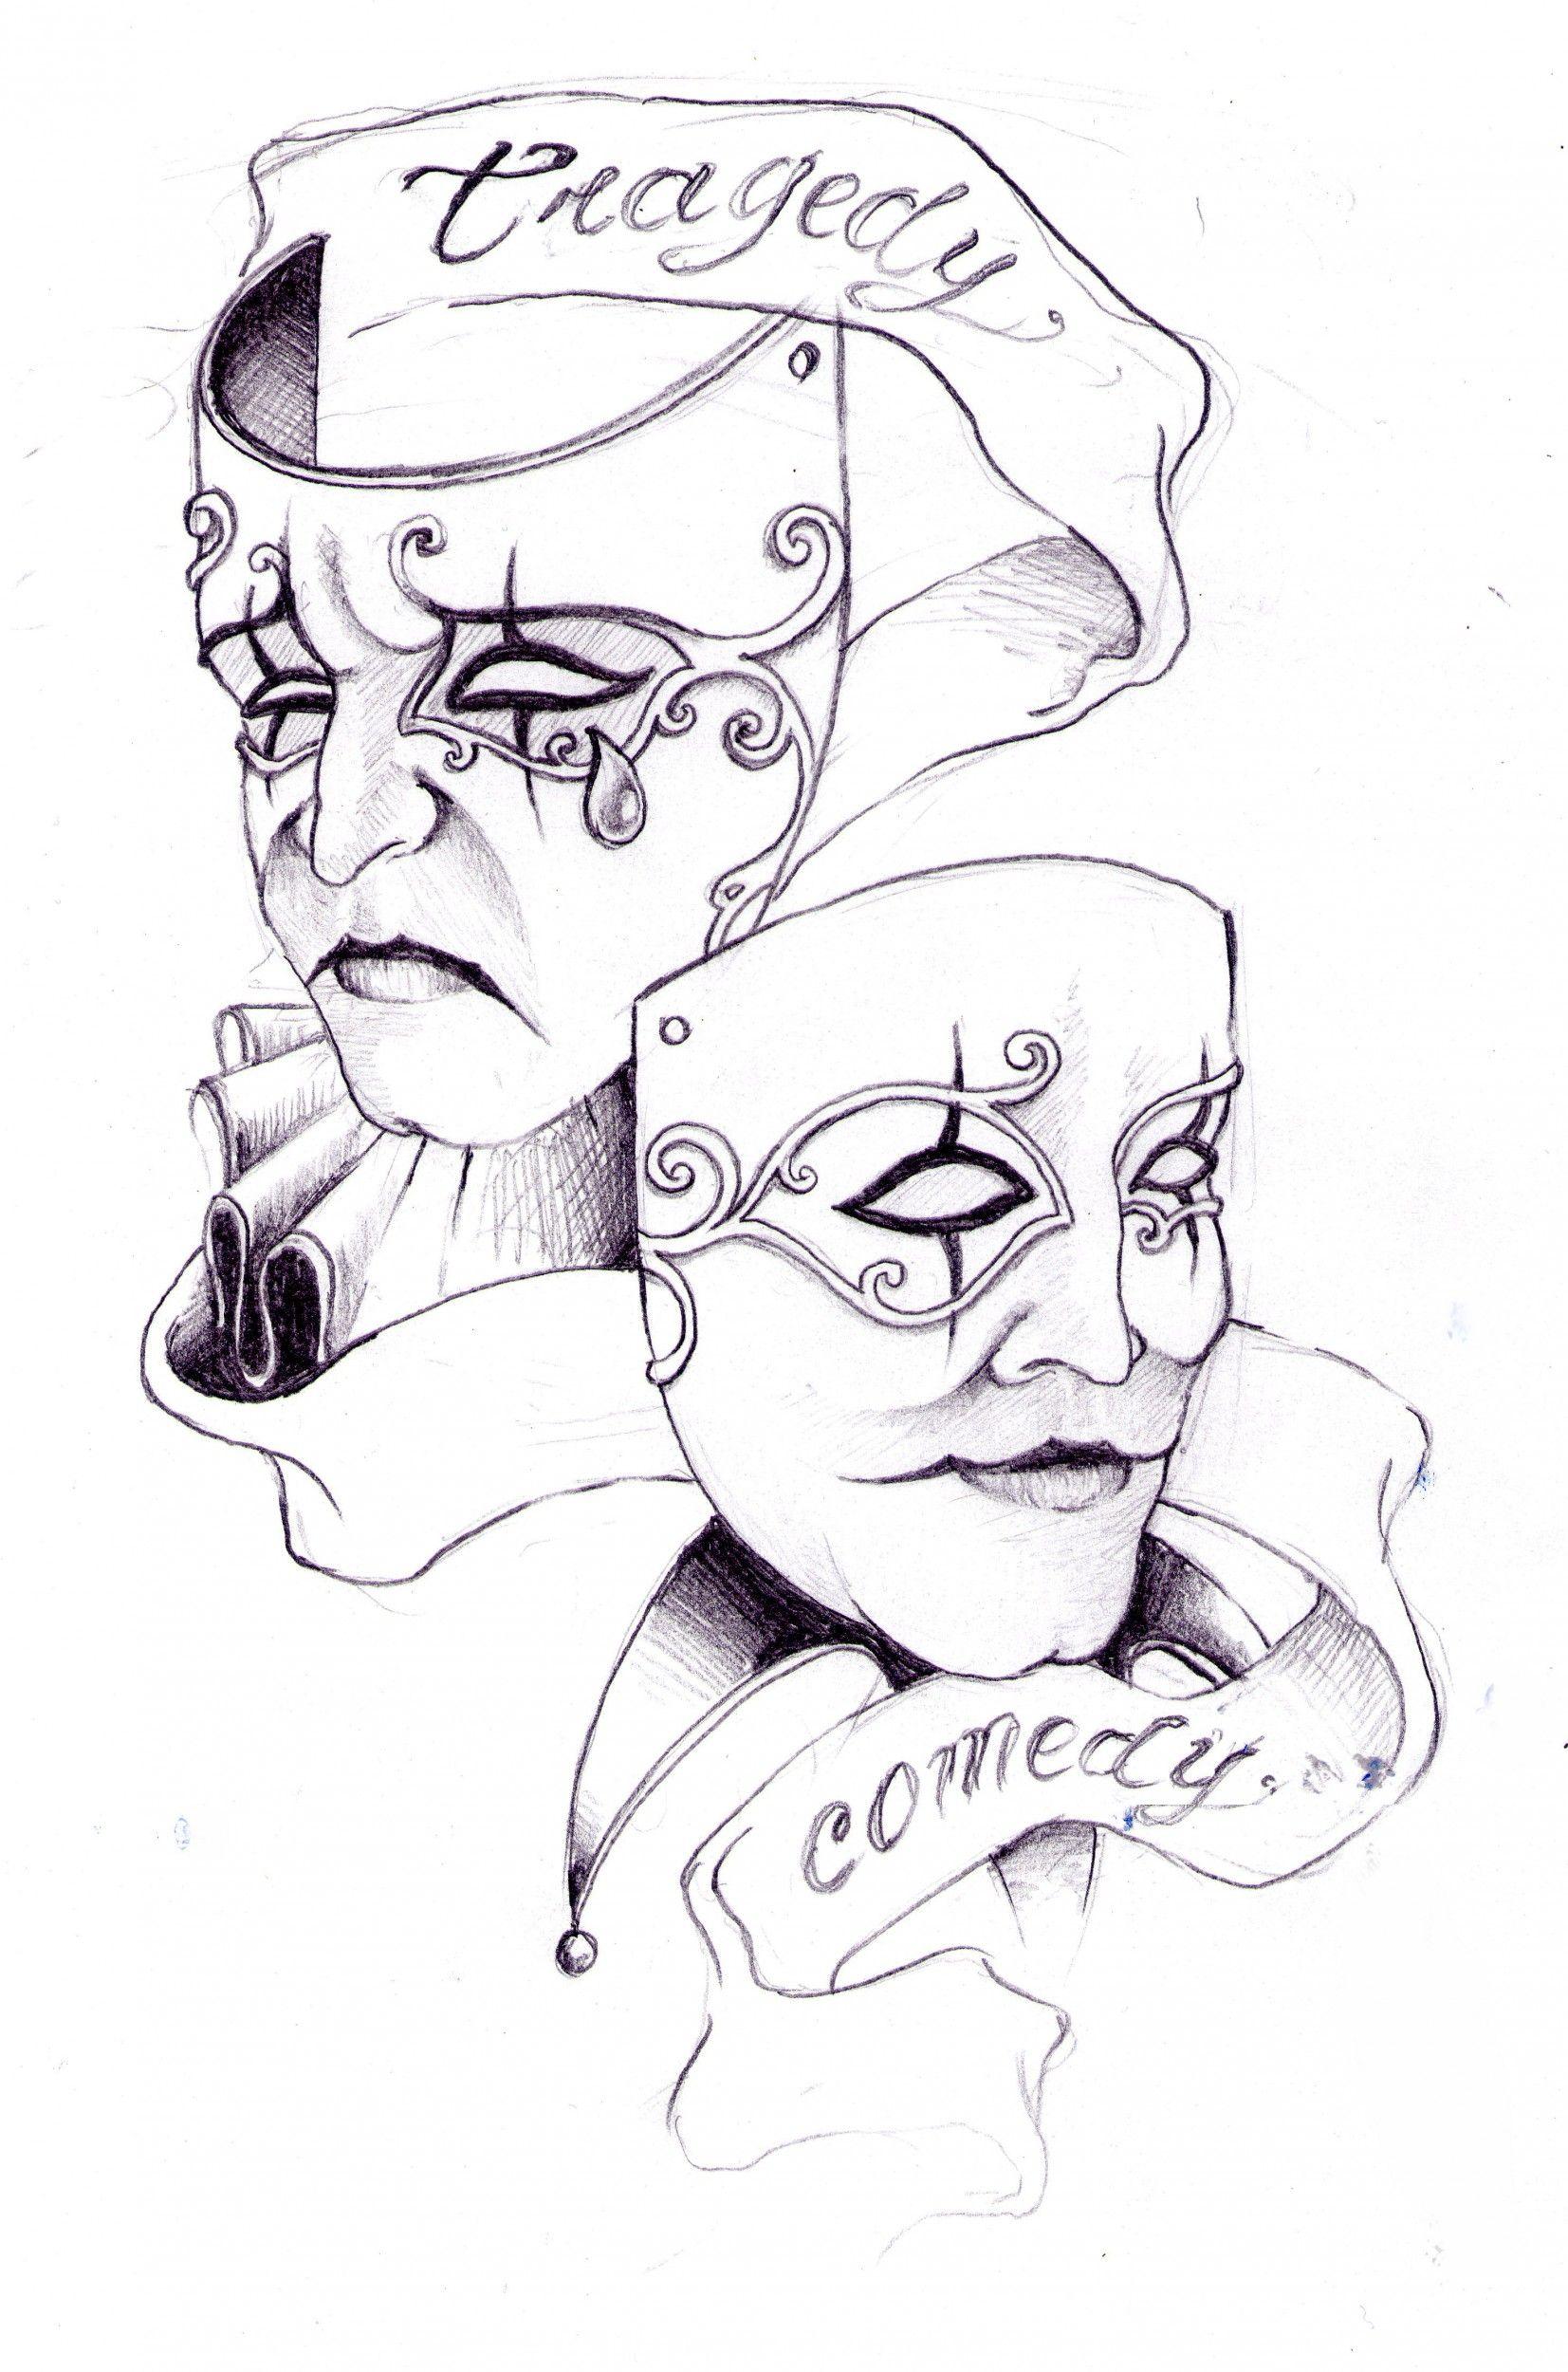 Skull Drama Face Tattoo: Drama Faces Tattoo Girly - Google Search